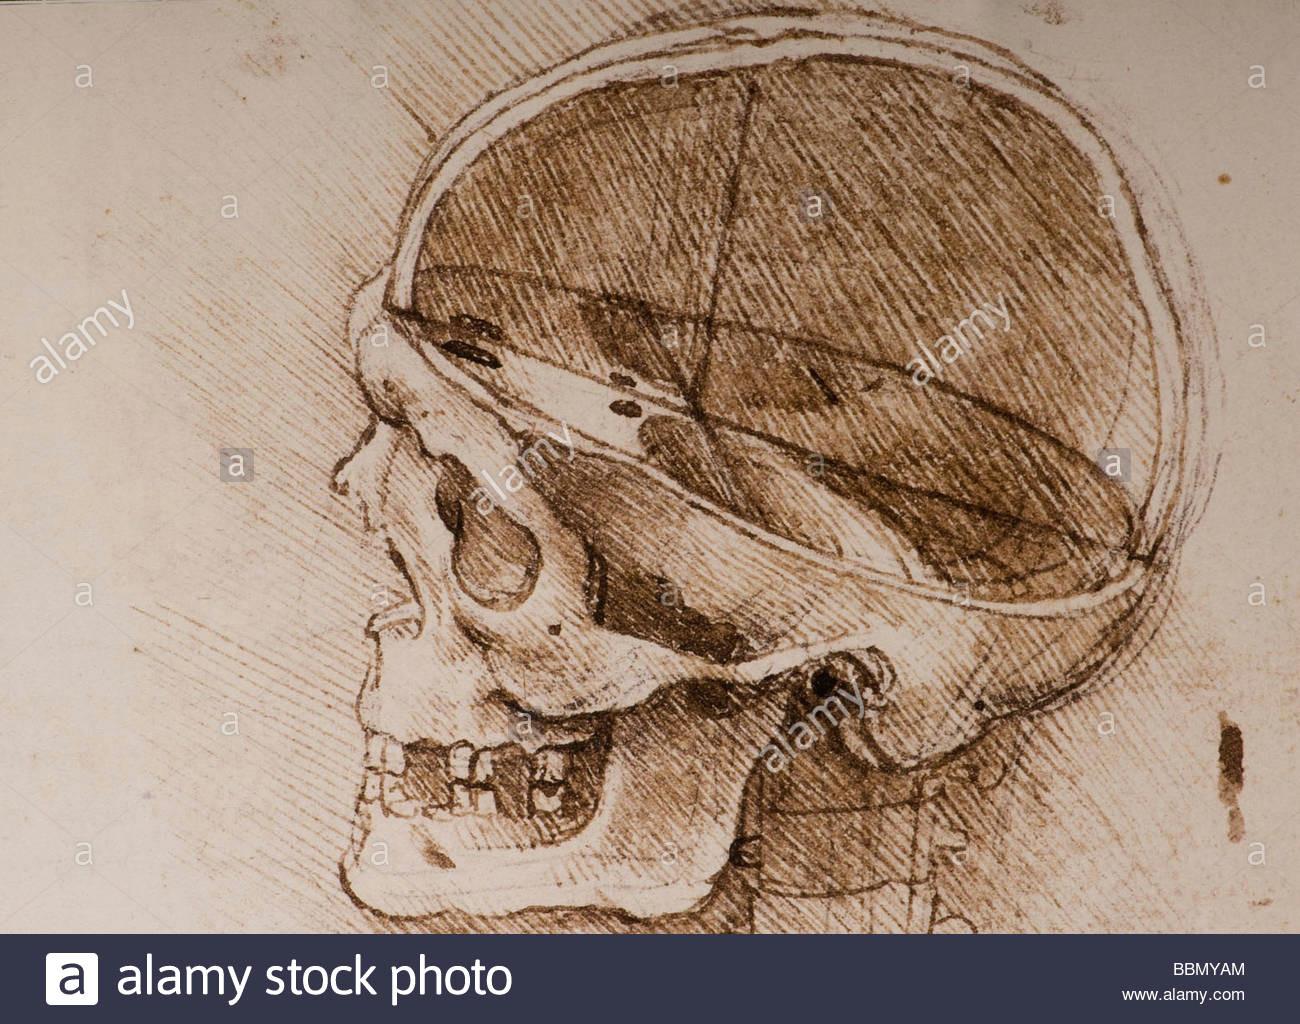 detail anatomical studies of the human skull by leonardo da vinci stock image